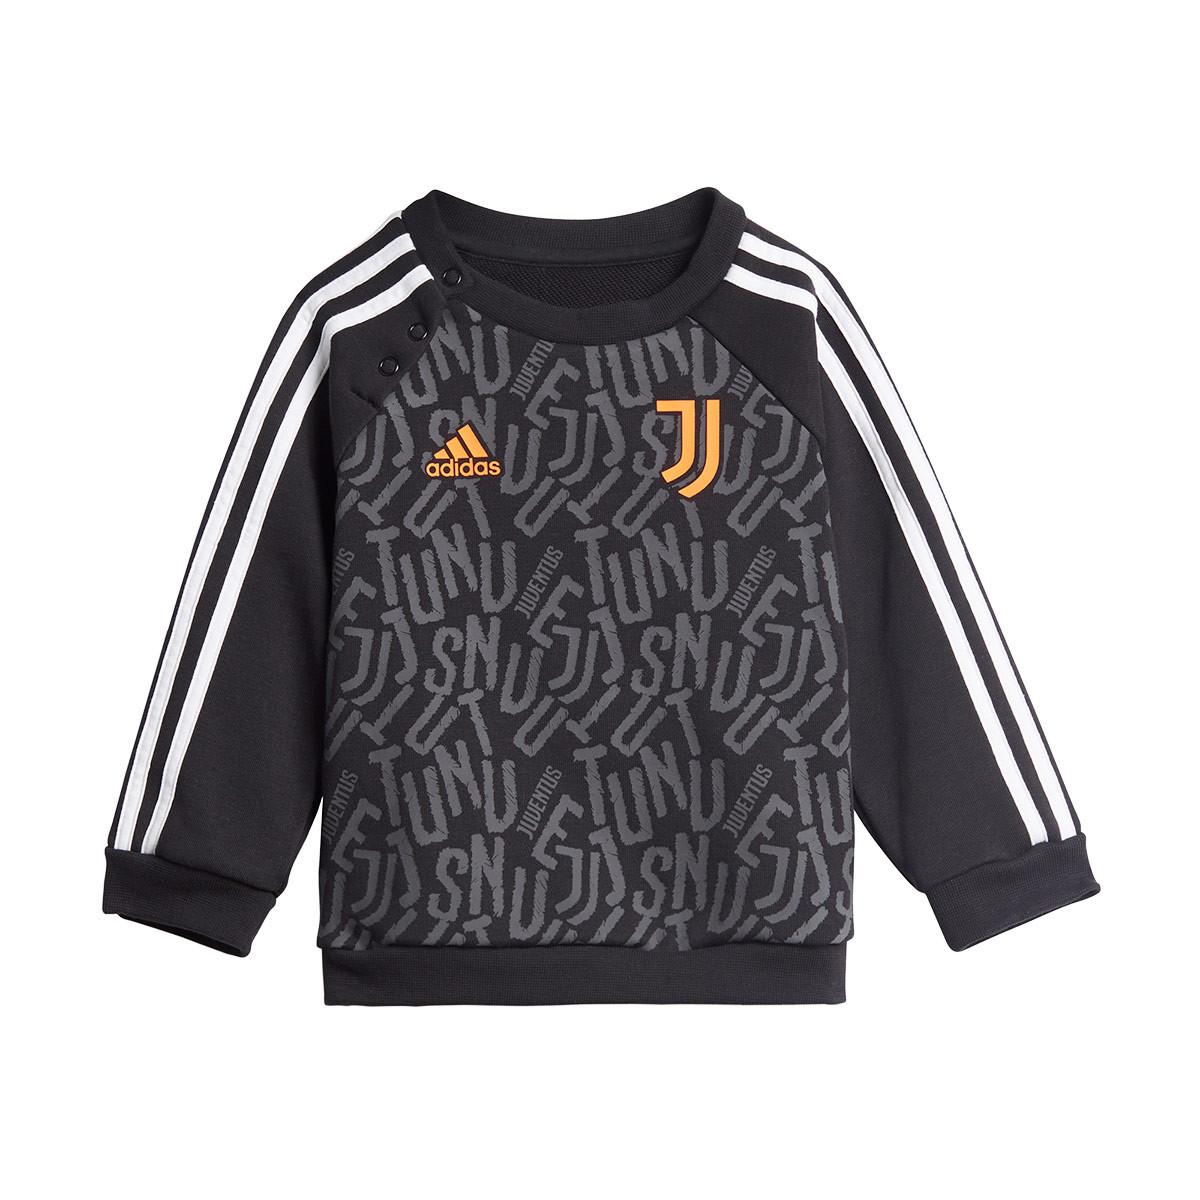 Fusión Sobretodo Artificial  Tracksuit adidas Juventus 2020-2021 Bebé Black-White-App signal orange -  Football store Fútbol Emotion